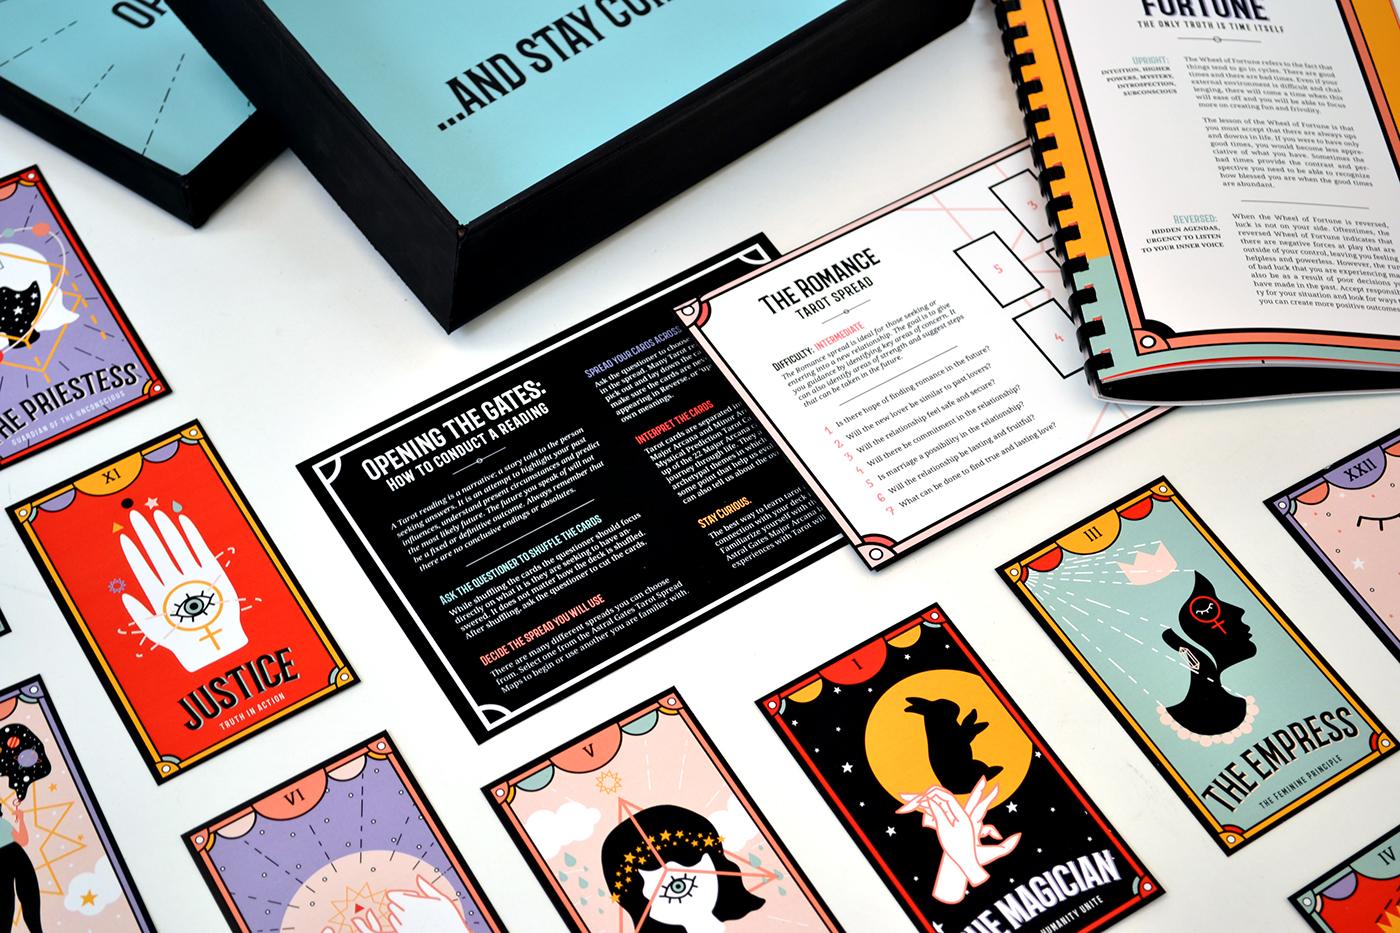 Astral Gates Mystical Prediction Tarot Cards on Behance